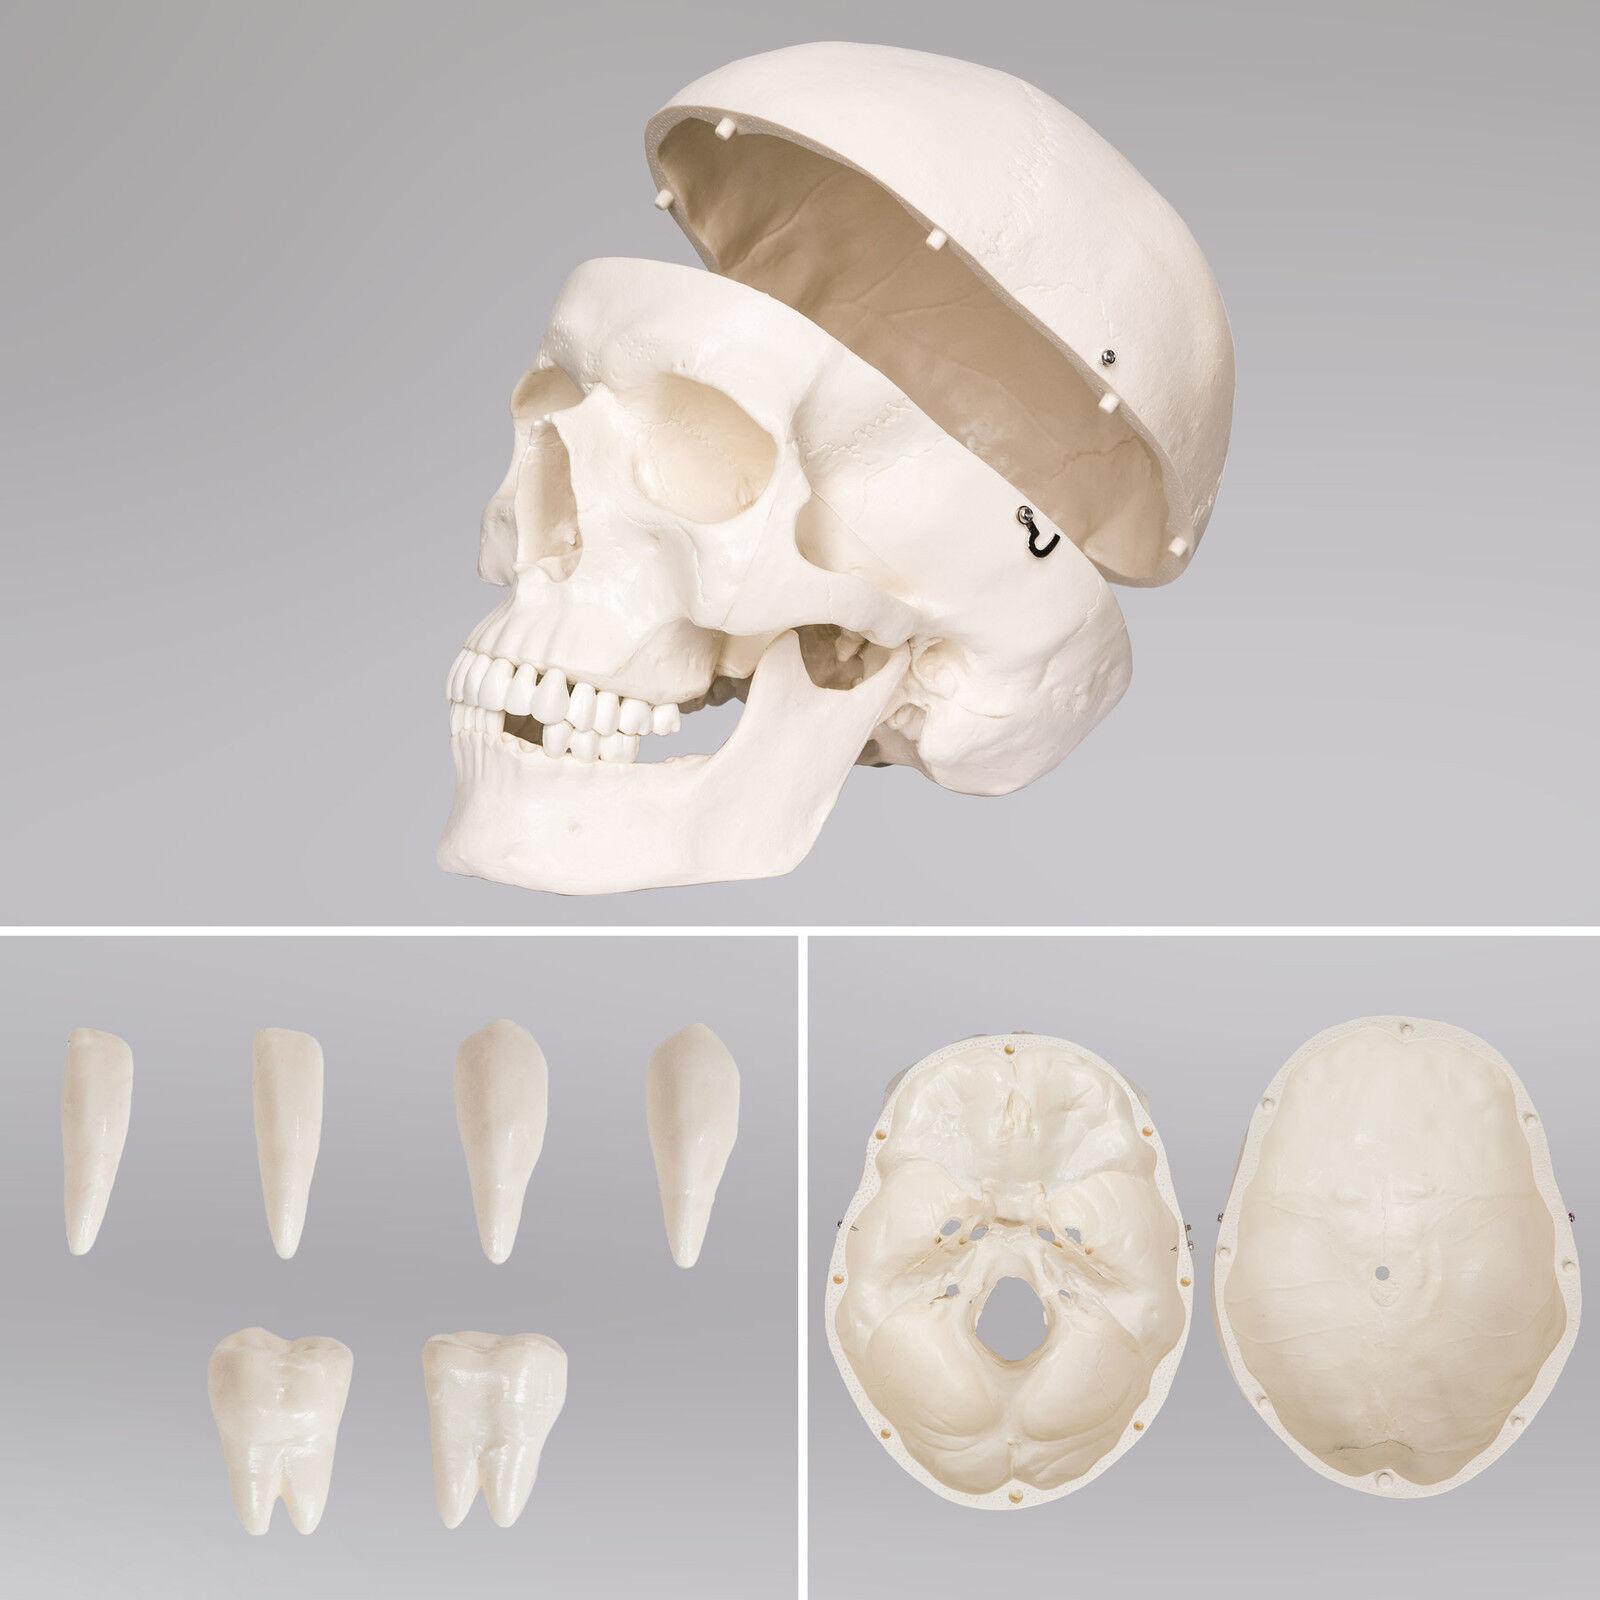 Menschliches Stativ Skelett Anatomie Lehrmodell | eBay